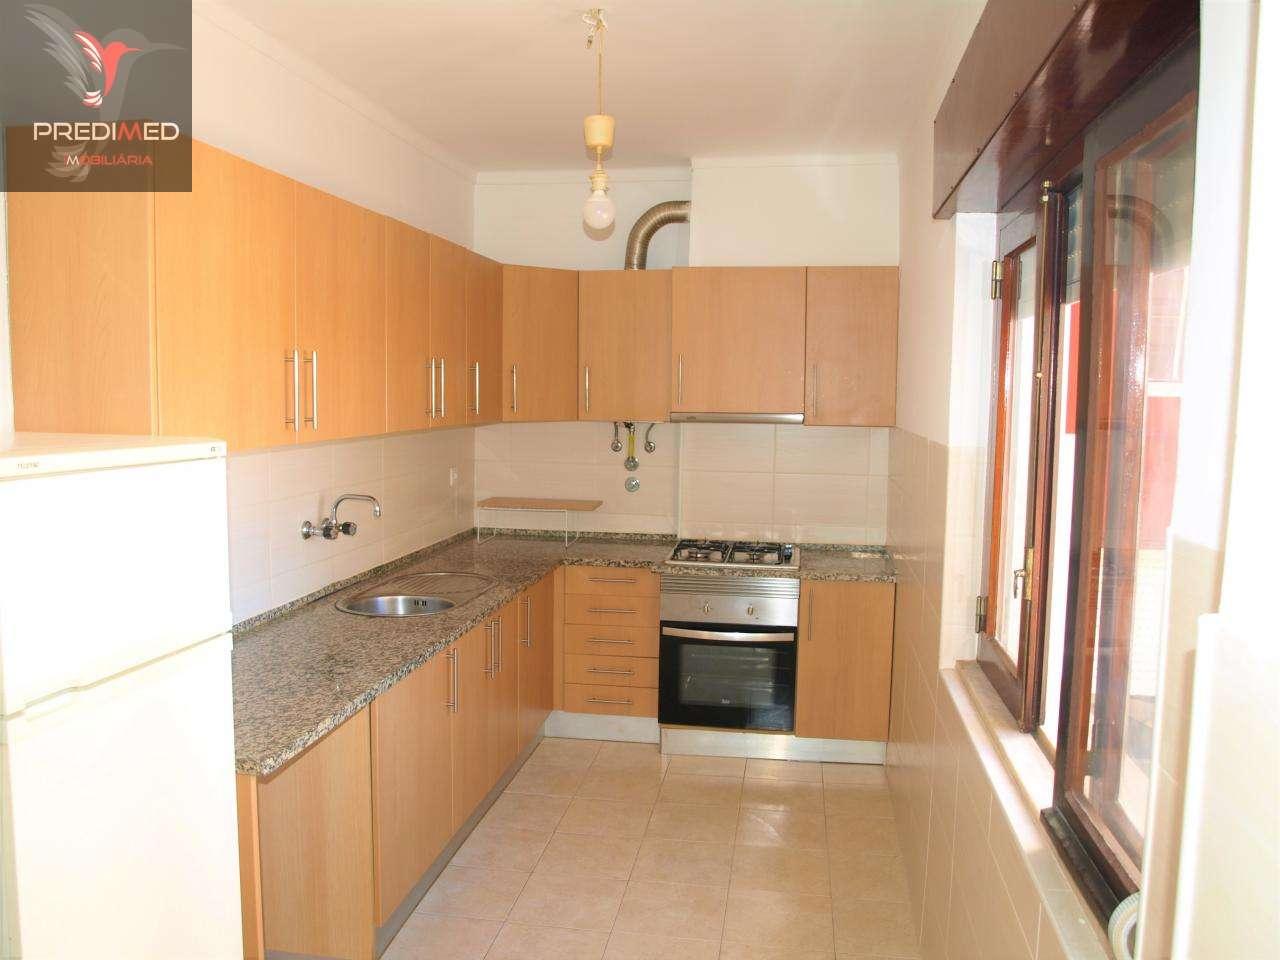 Apartamento para arrendar, Corroios, Setúbal - Foto 1